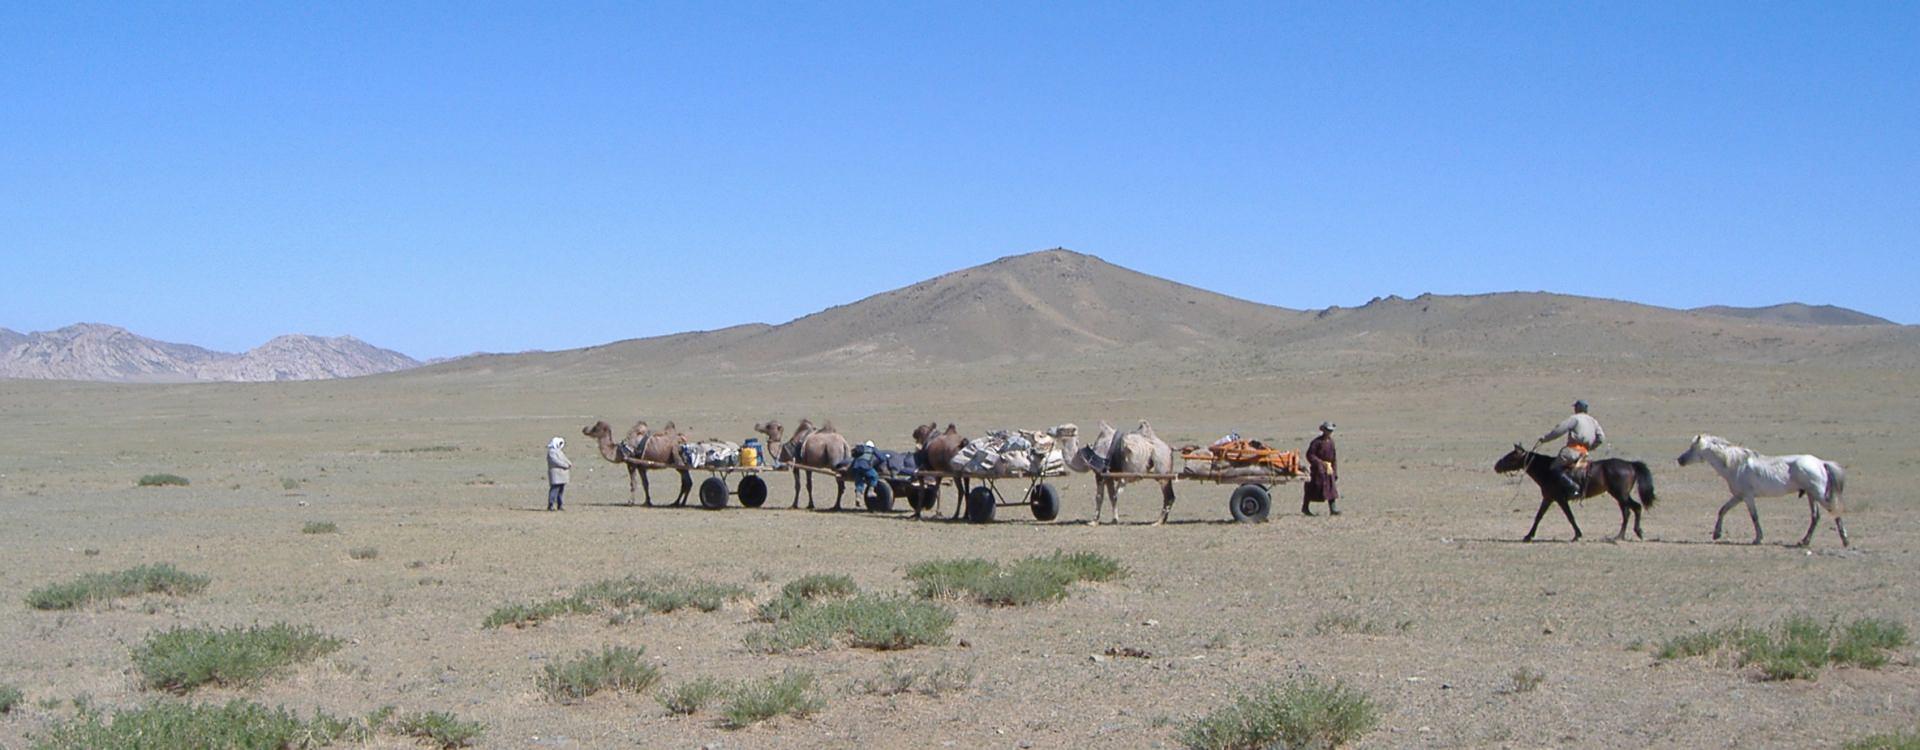 Camel carts on the Gobi Steppe